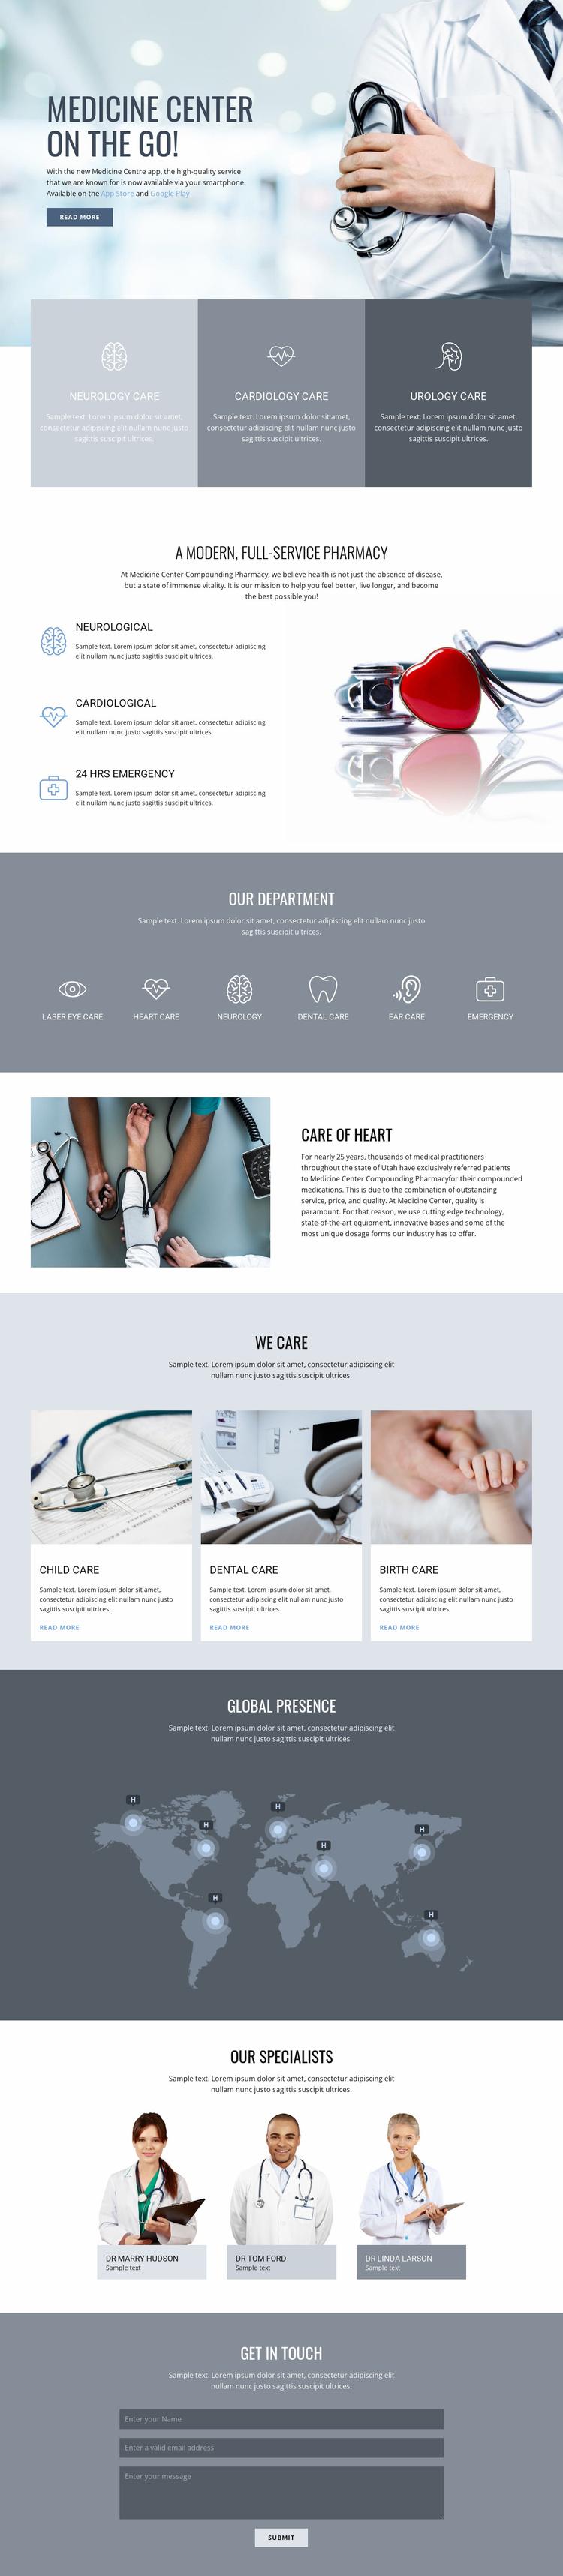 Center of quality medicine Landing Page